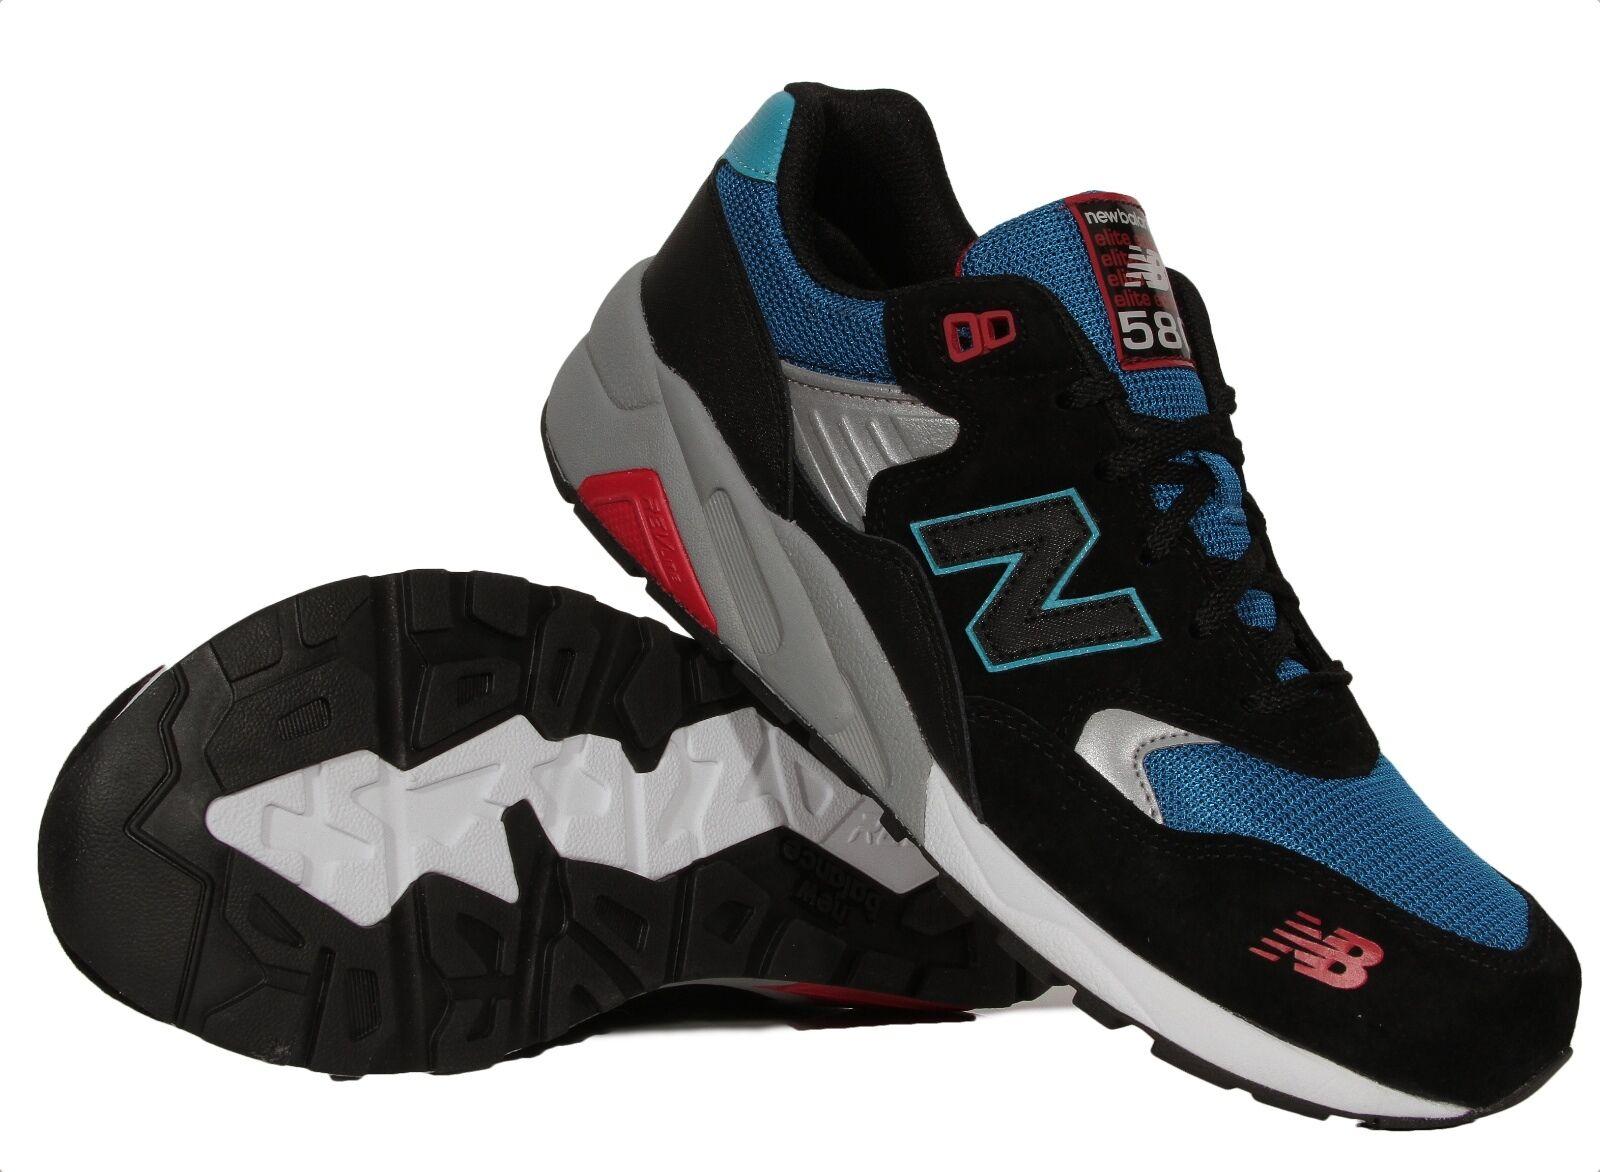 New Balance 580 Elite Edition Pinball noir hommes Running Chaussures MRT580BF NIB